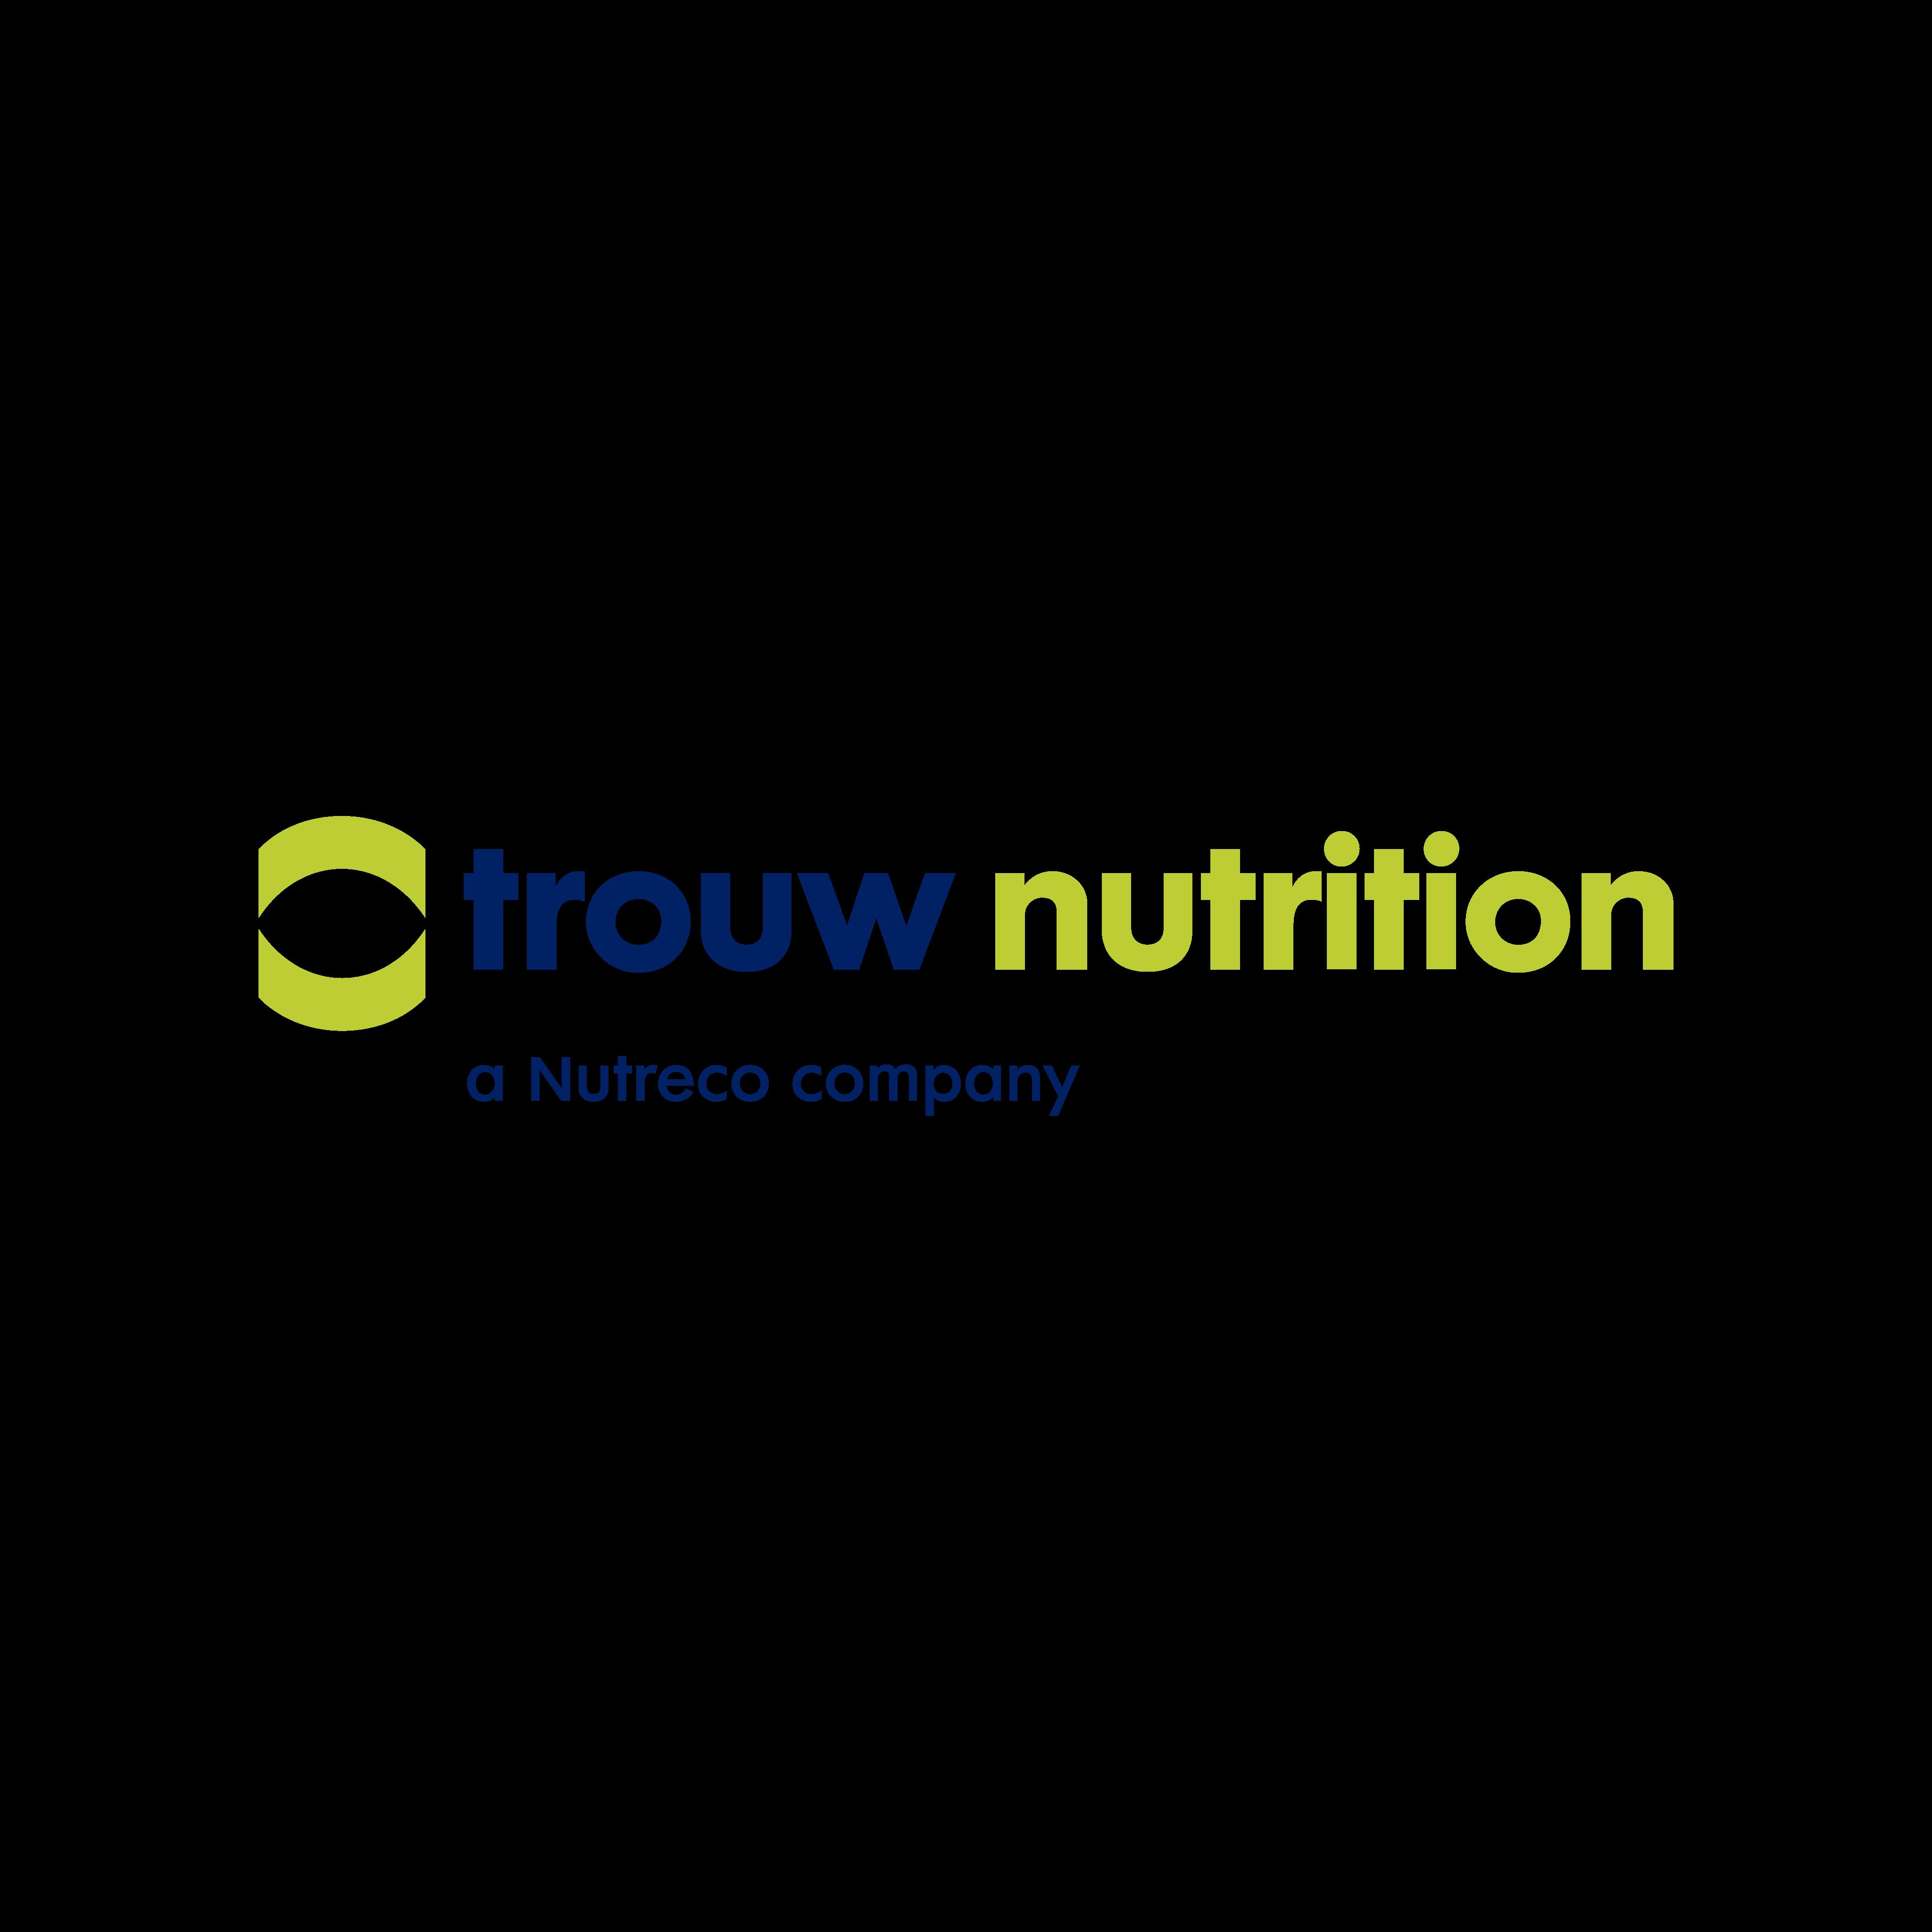 trouw nutrition logo 0 - Trouw Nutrition Logo